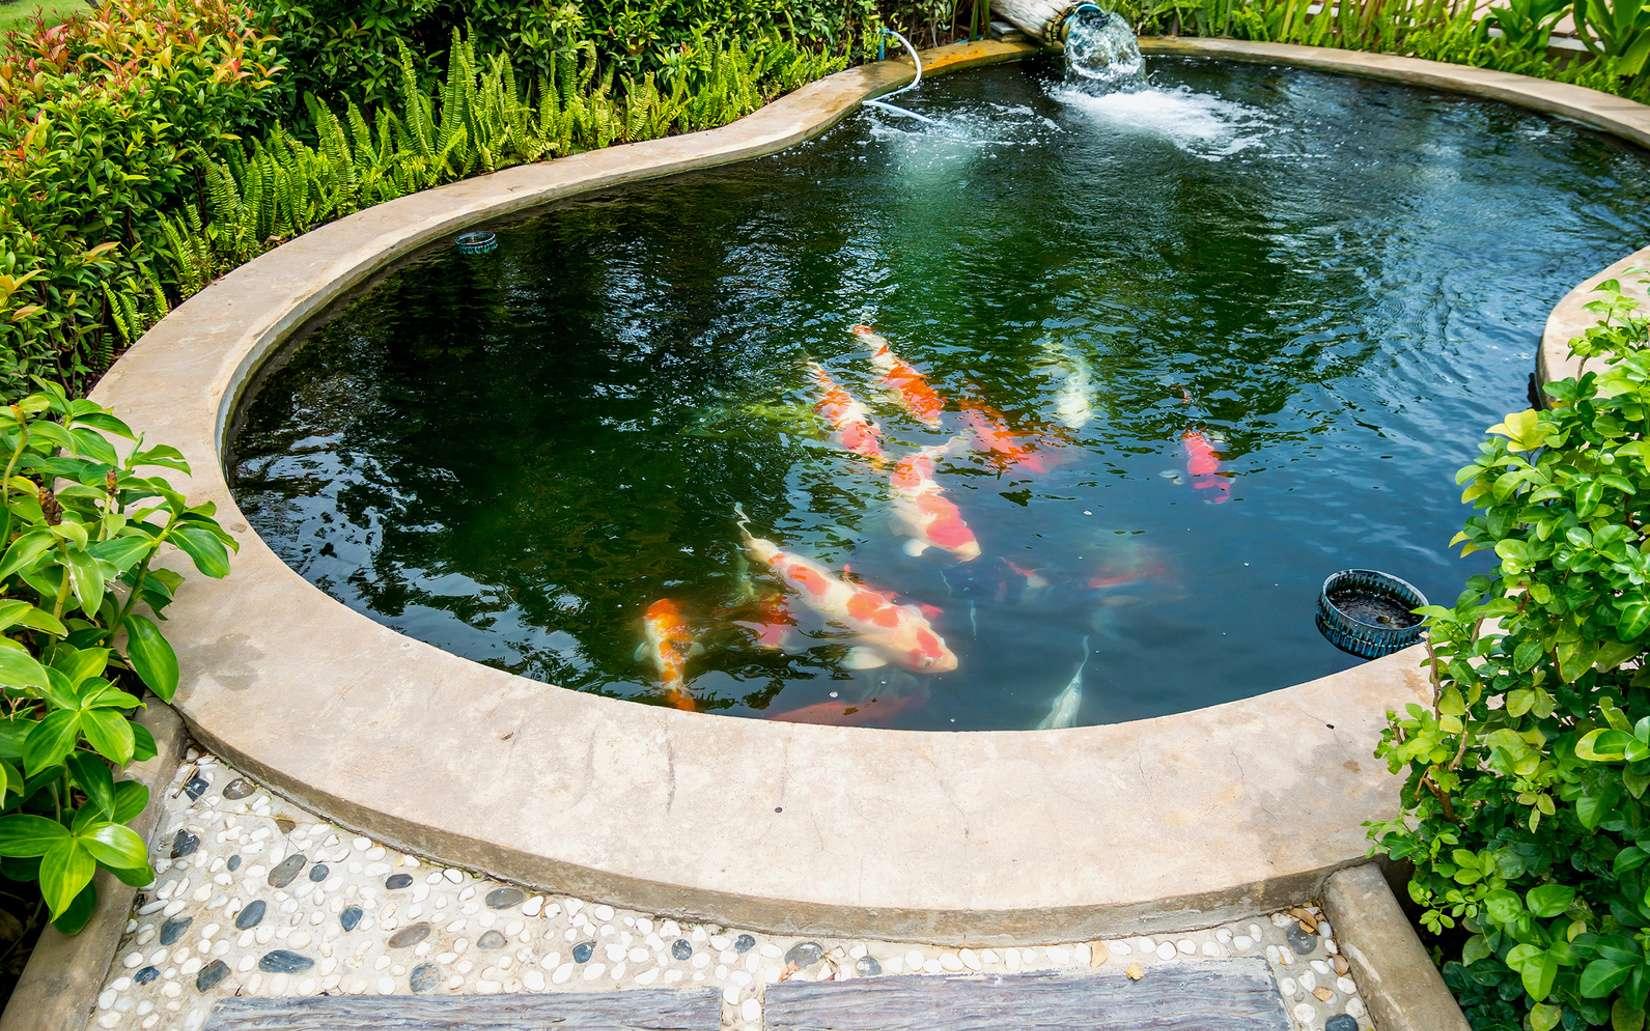 100 Incroyable Concepts Photo De Bassin A Poisson